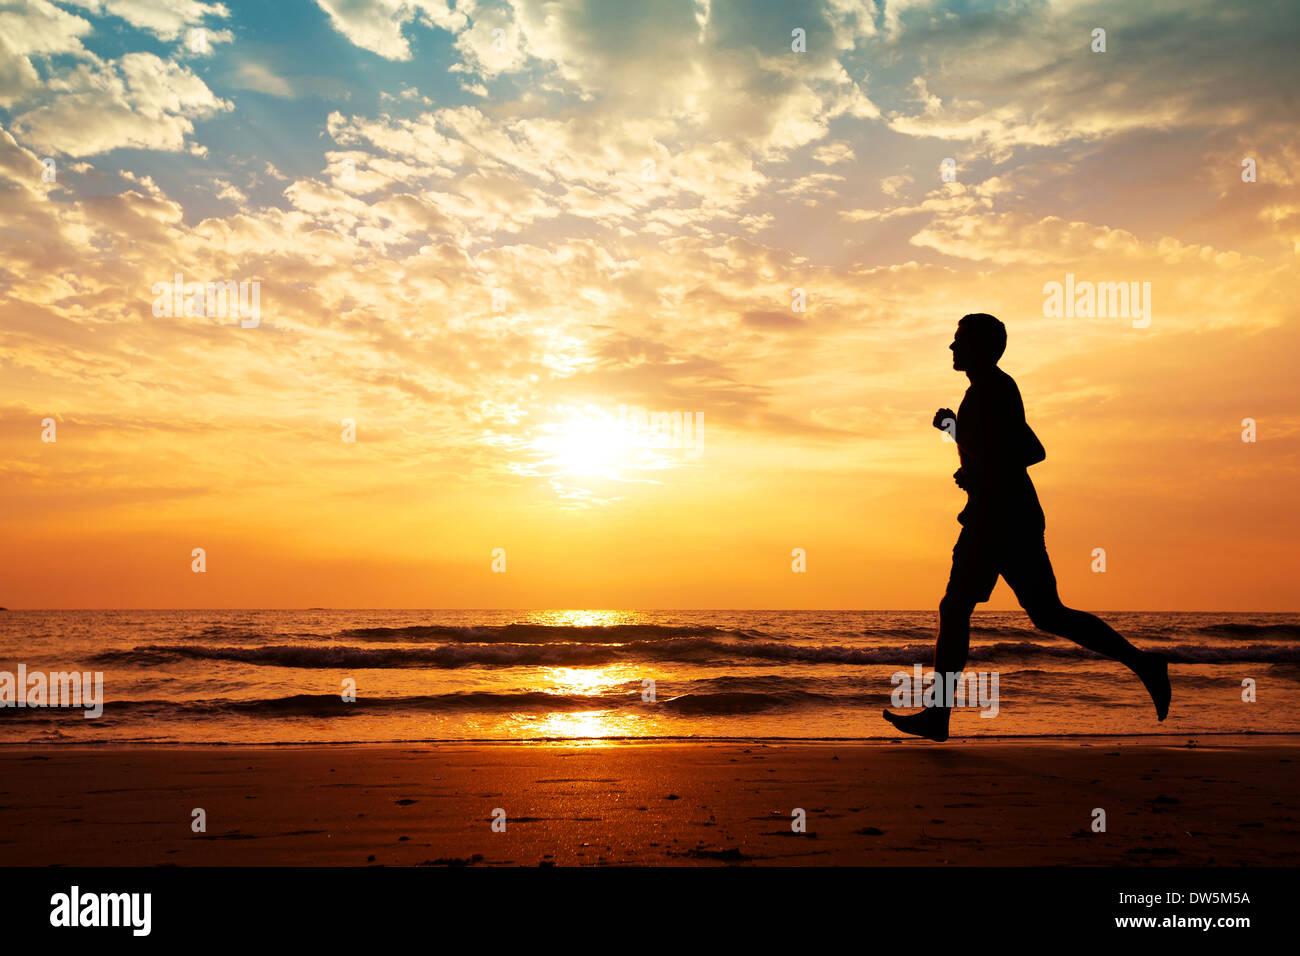 Silhouette der Mann läuft am Strand bei Sonnenuntergang Stockbild